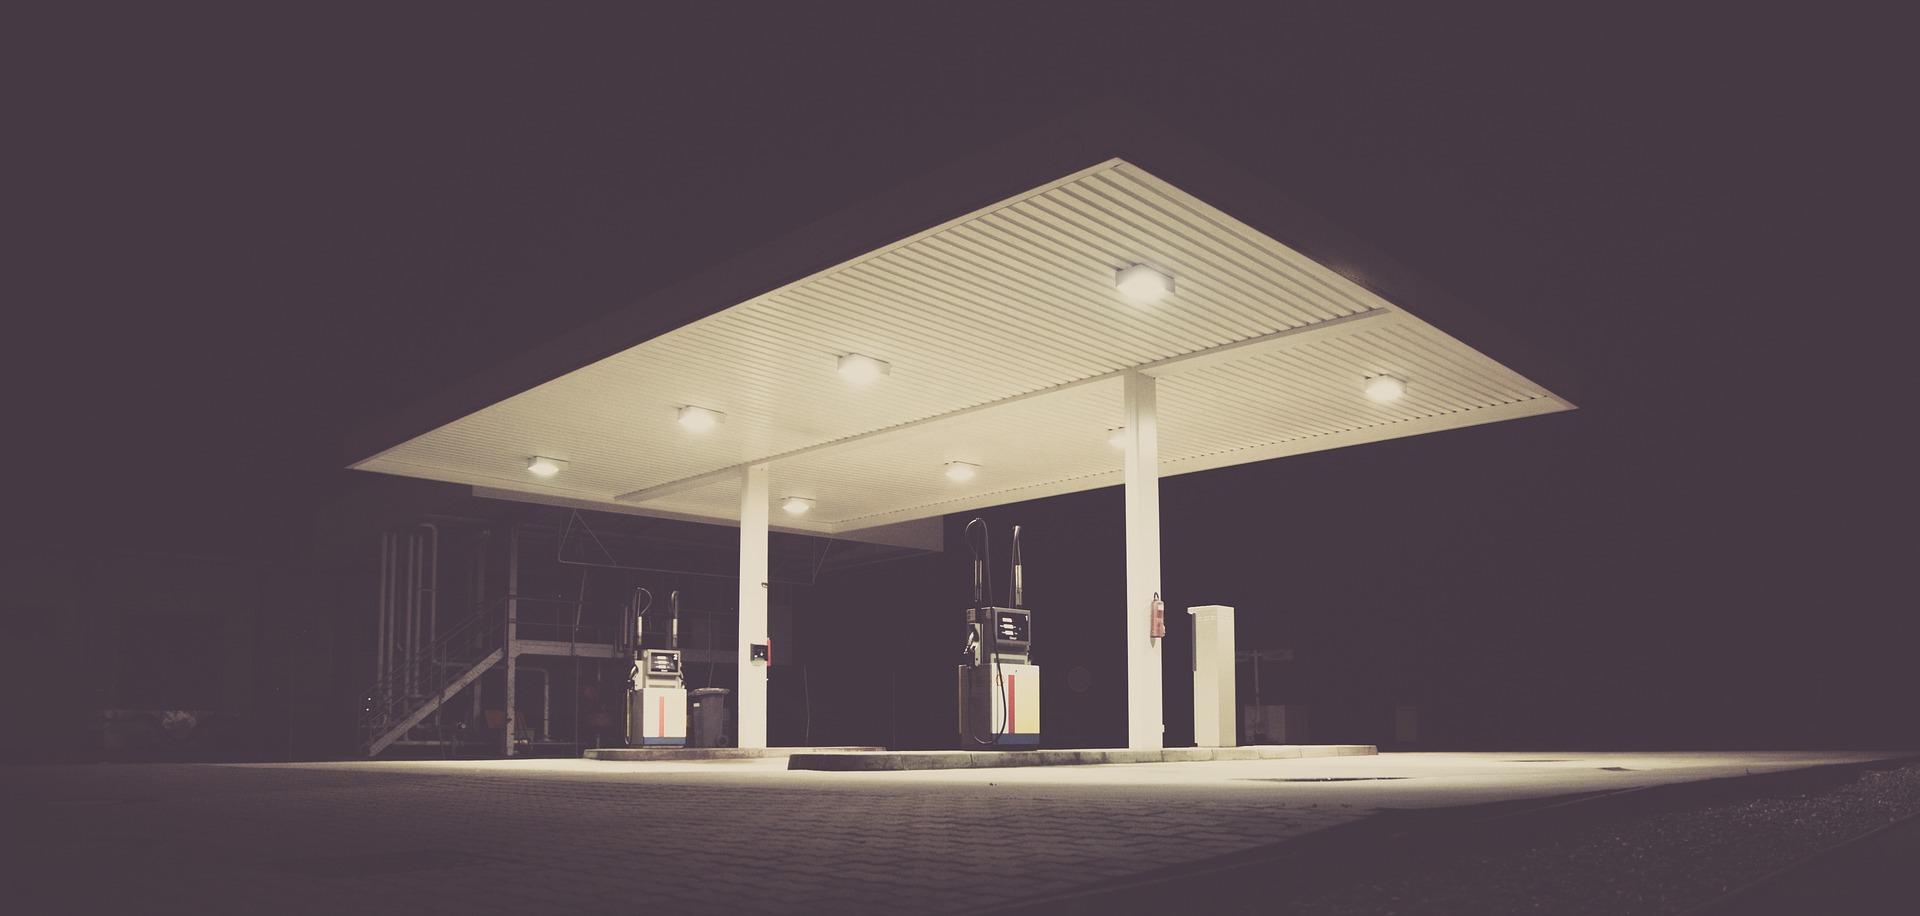 Prezzo della benzina oggi